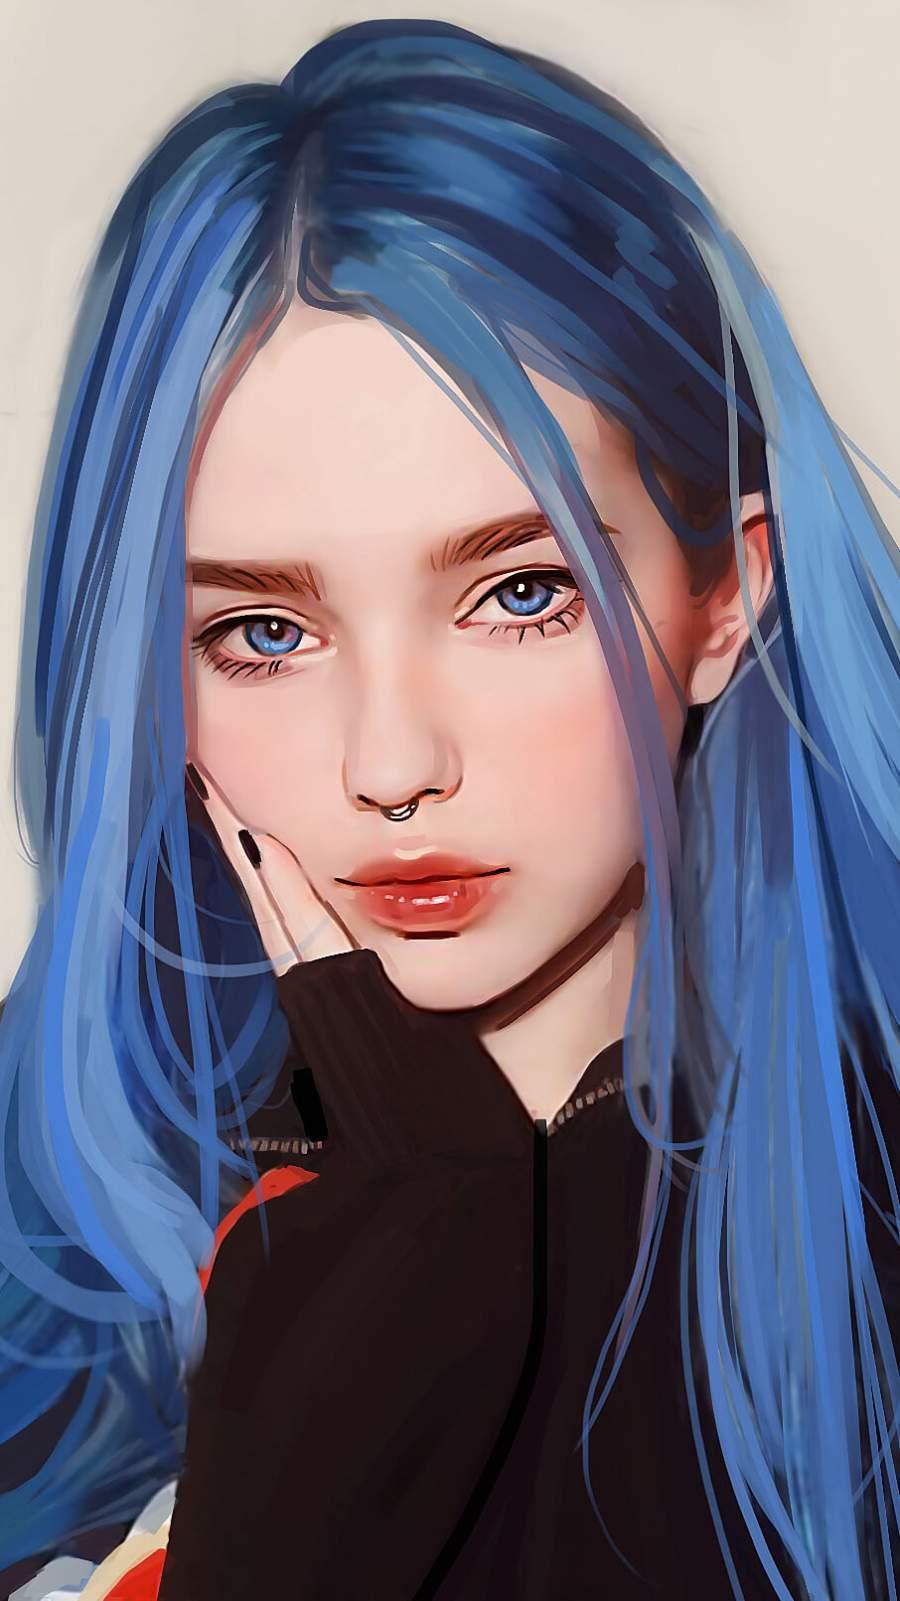 Blue Hairs Girl iPhone Wallpaper